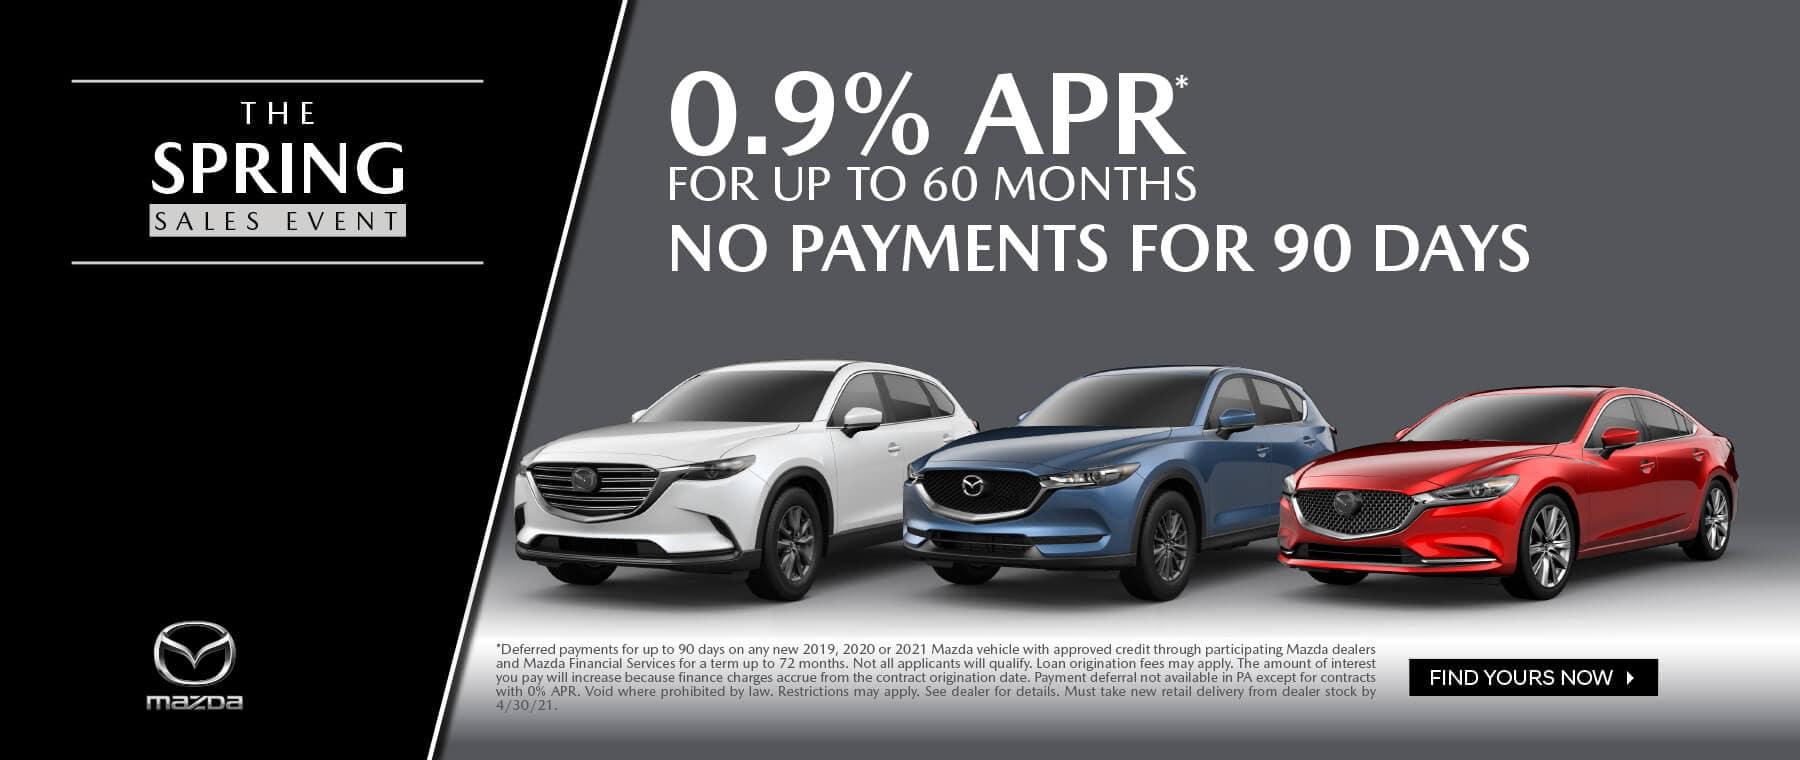 2021.04.15-Keffer-Mazda-APR-Web-Banner-Offer-Update-S51838vw-2